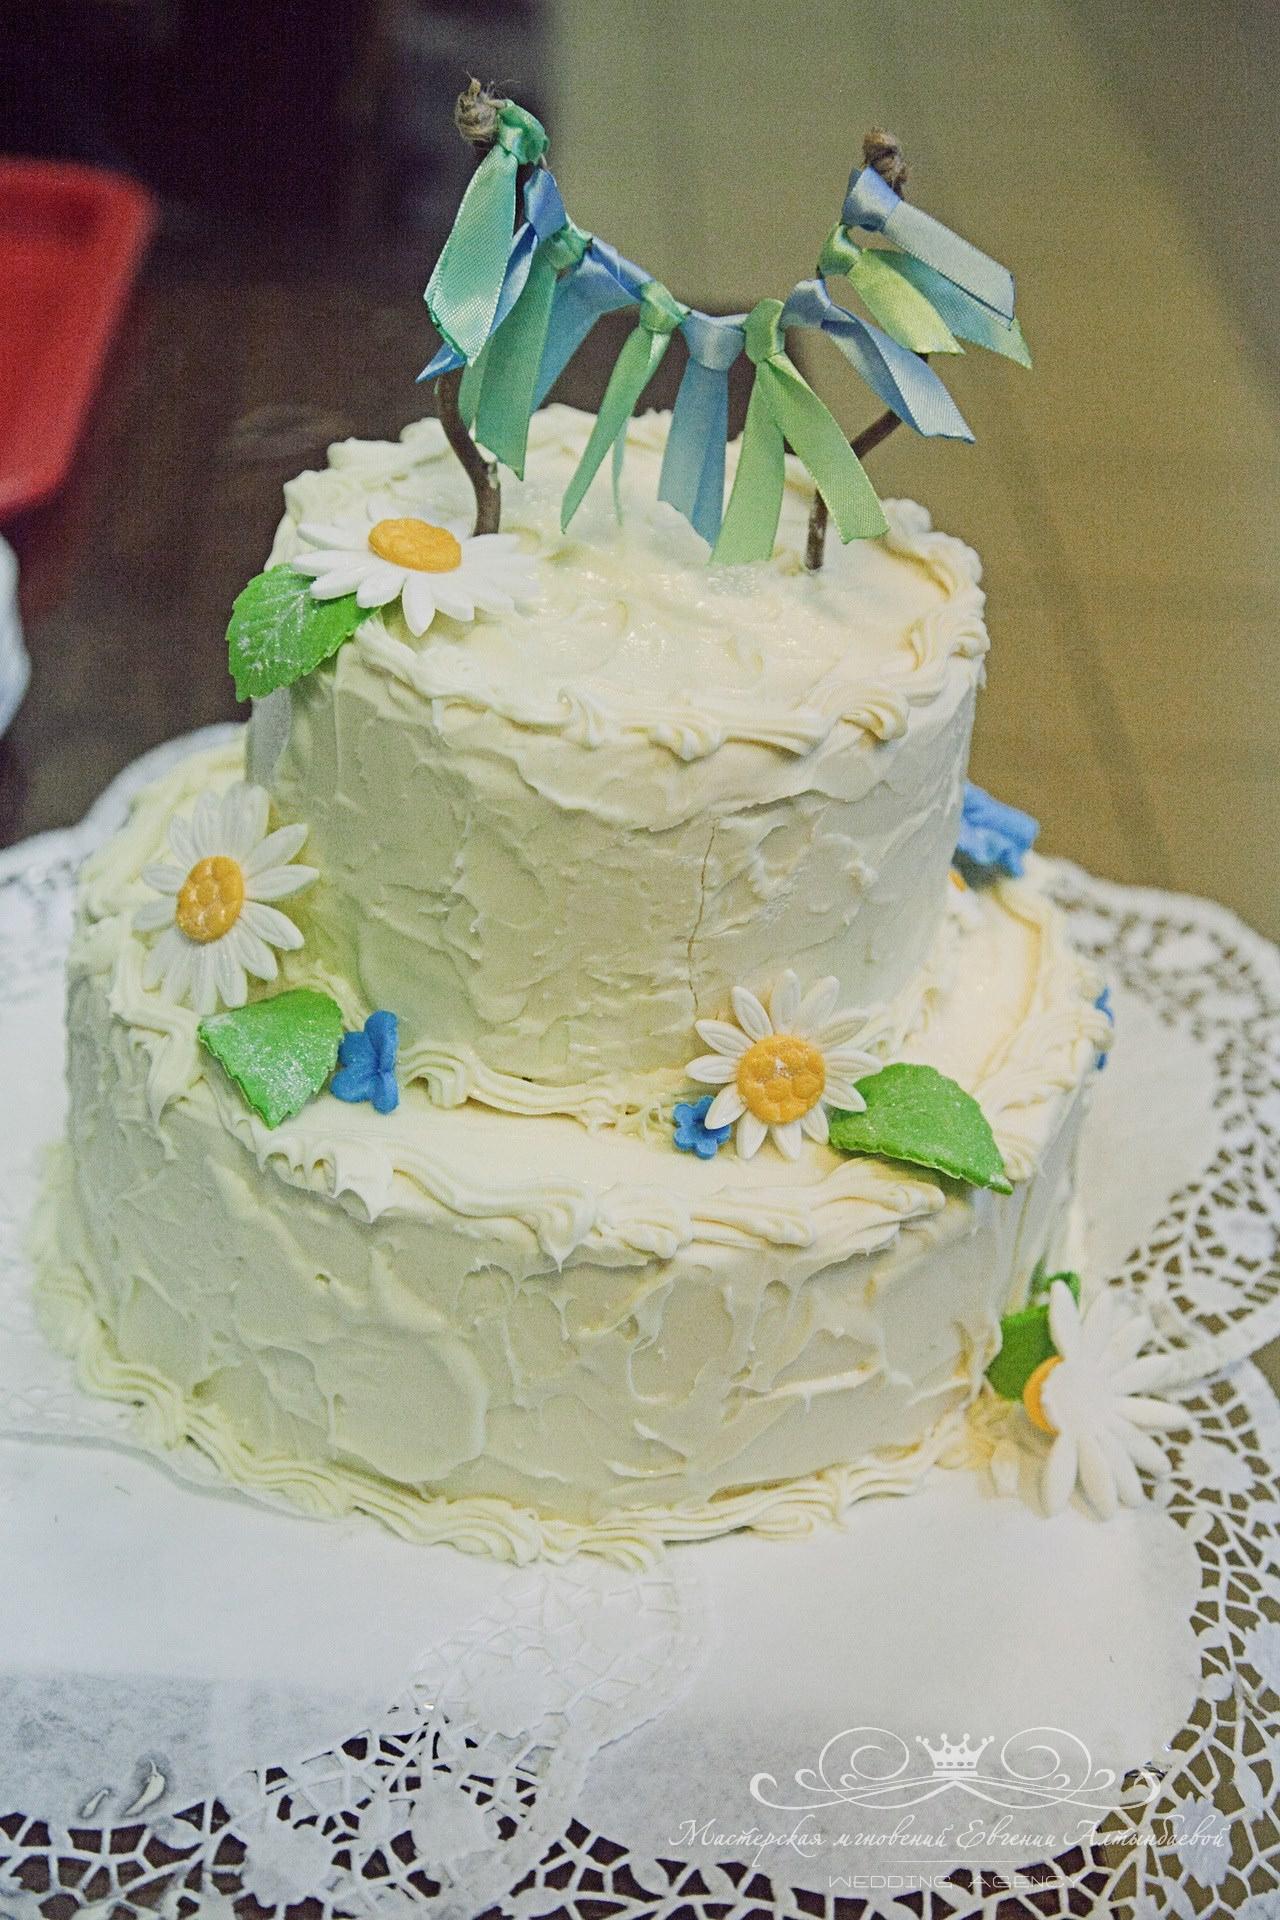 svadebnyi-tort-v-stile-rustic